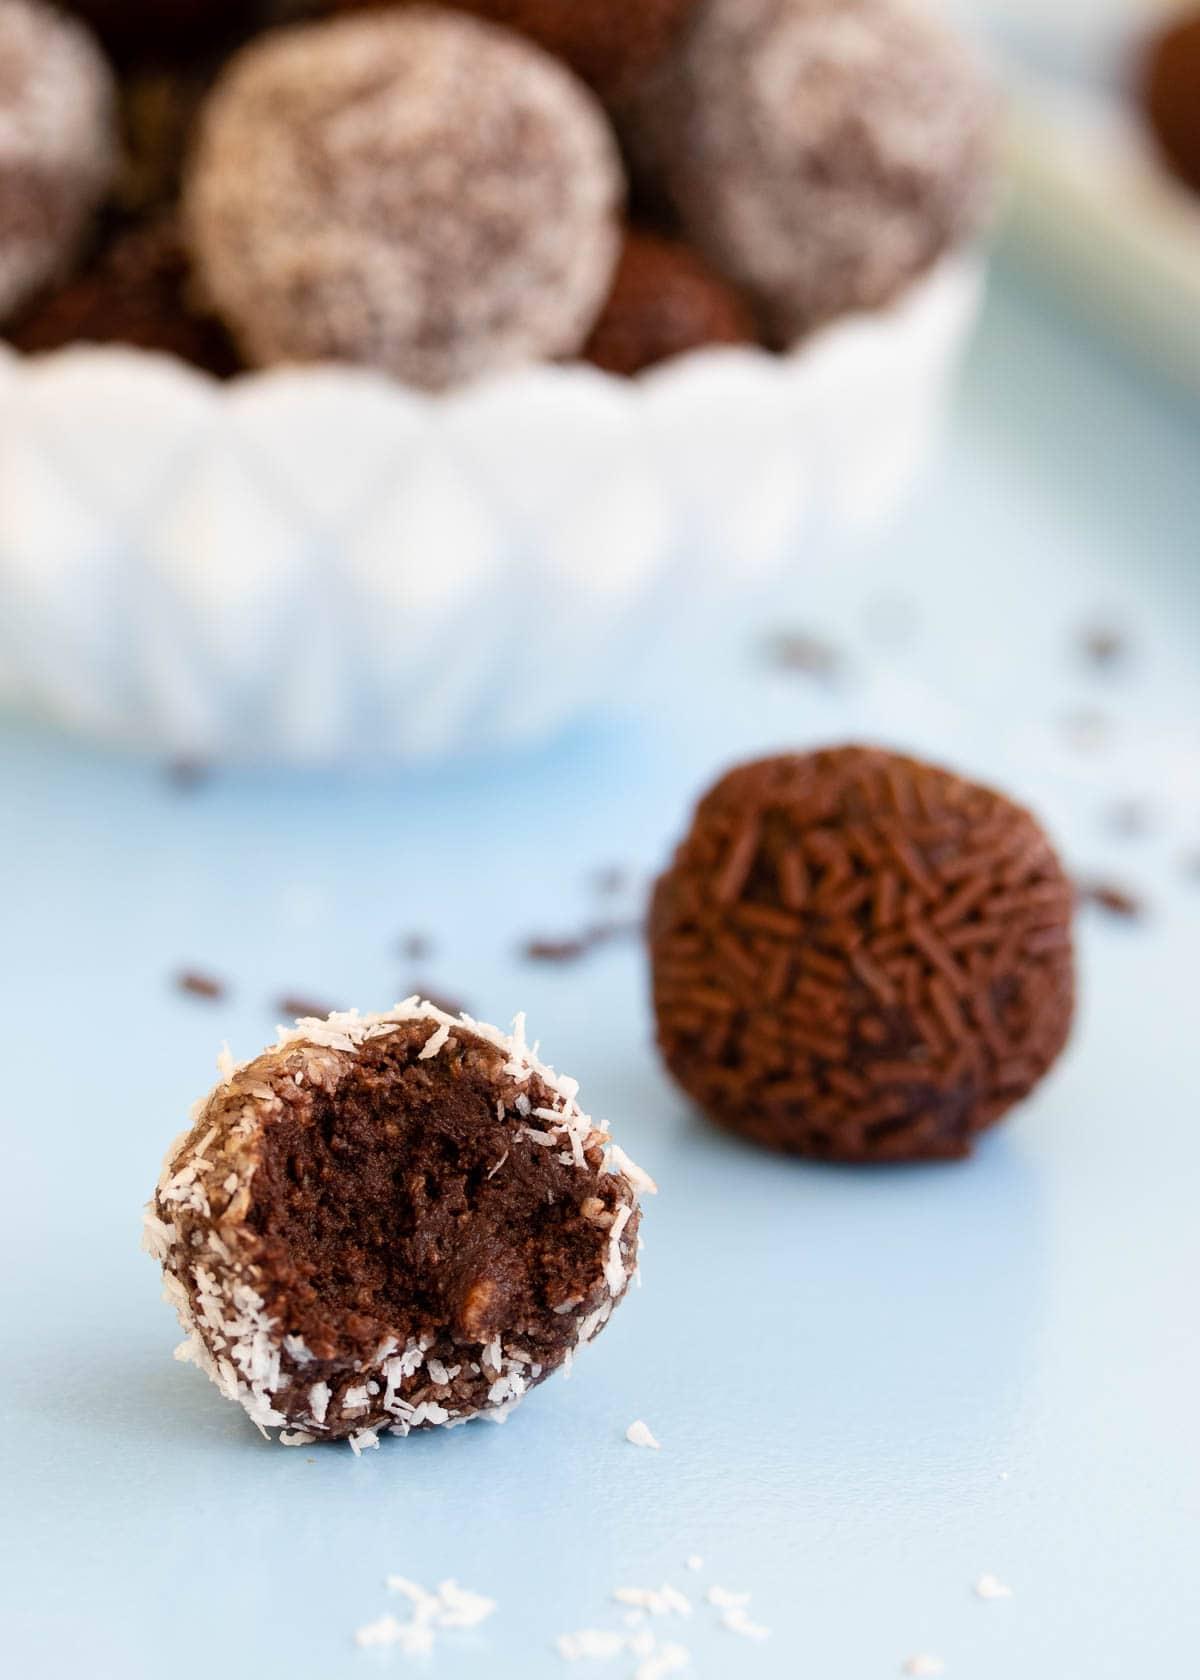 Chocolate coconut truffles (rum balls)